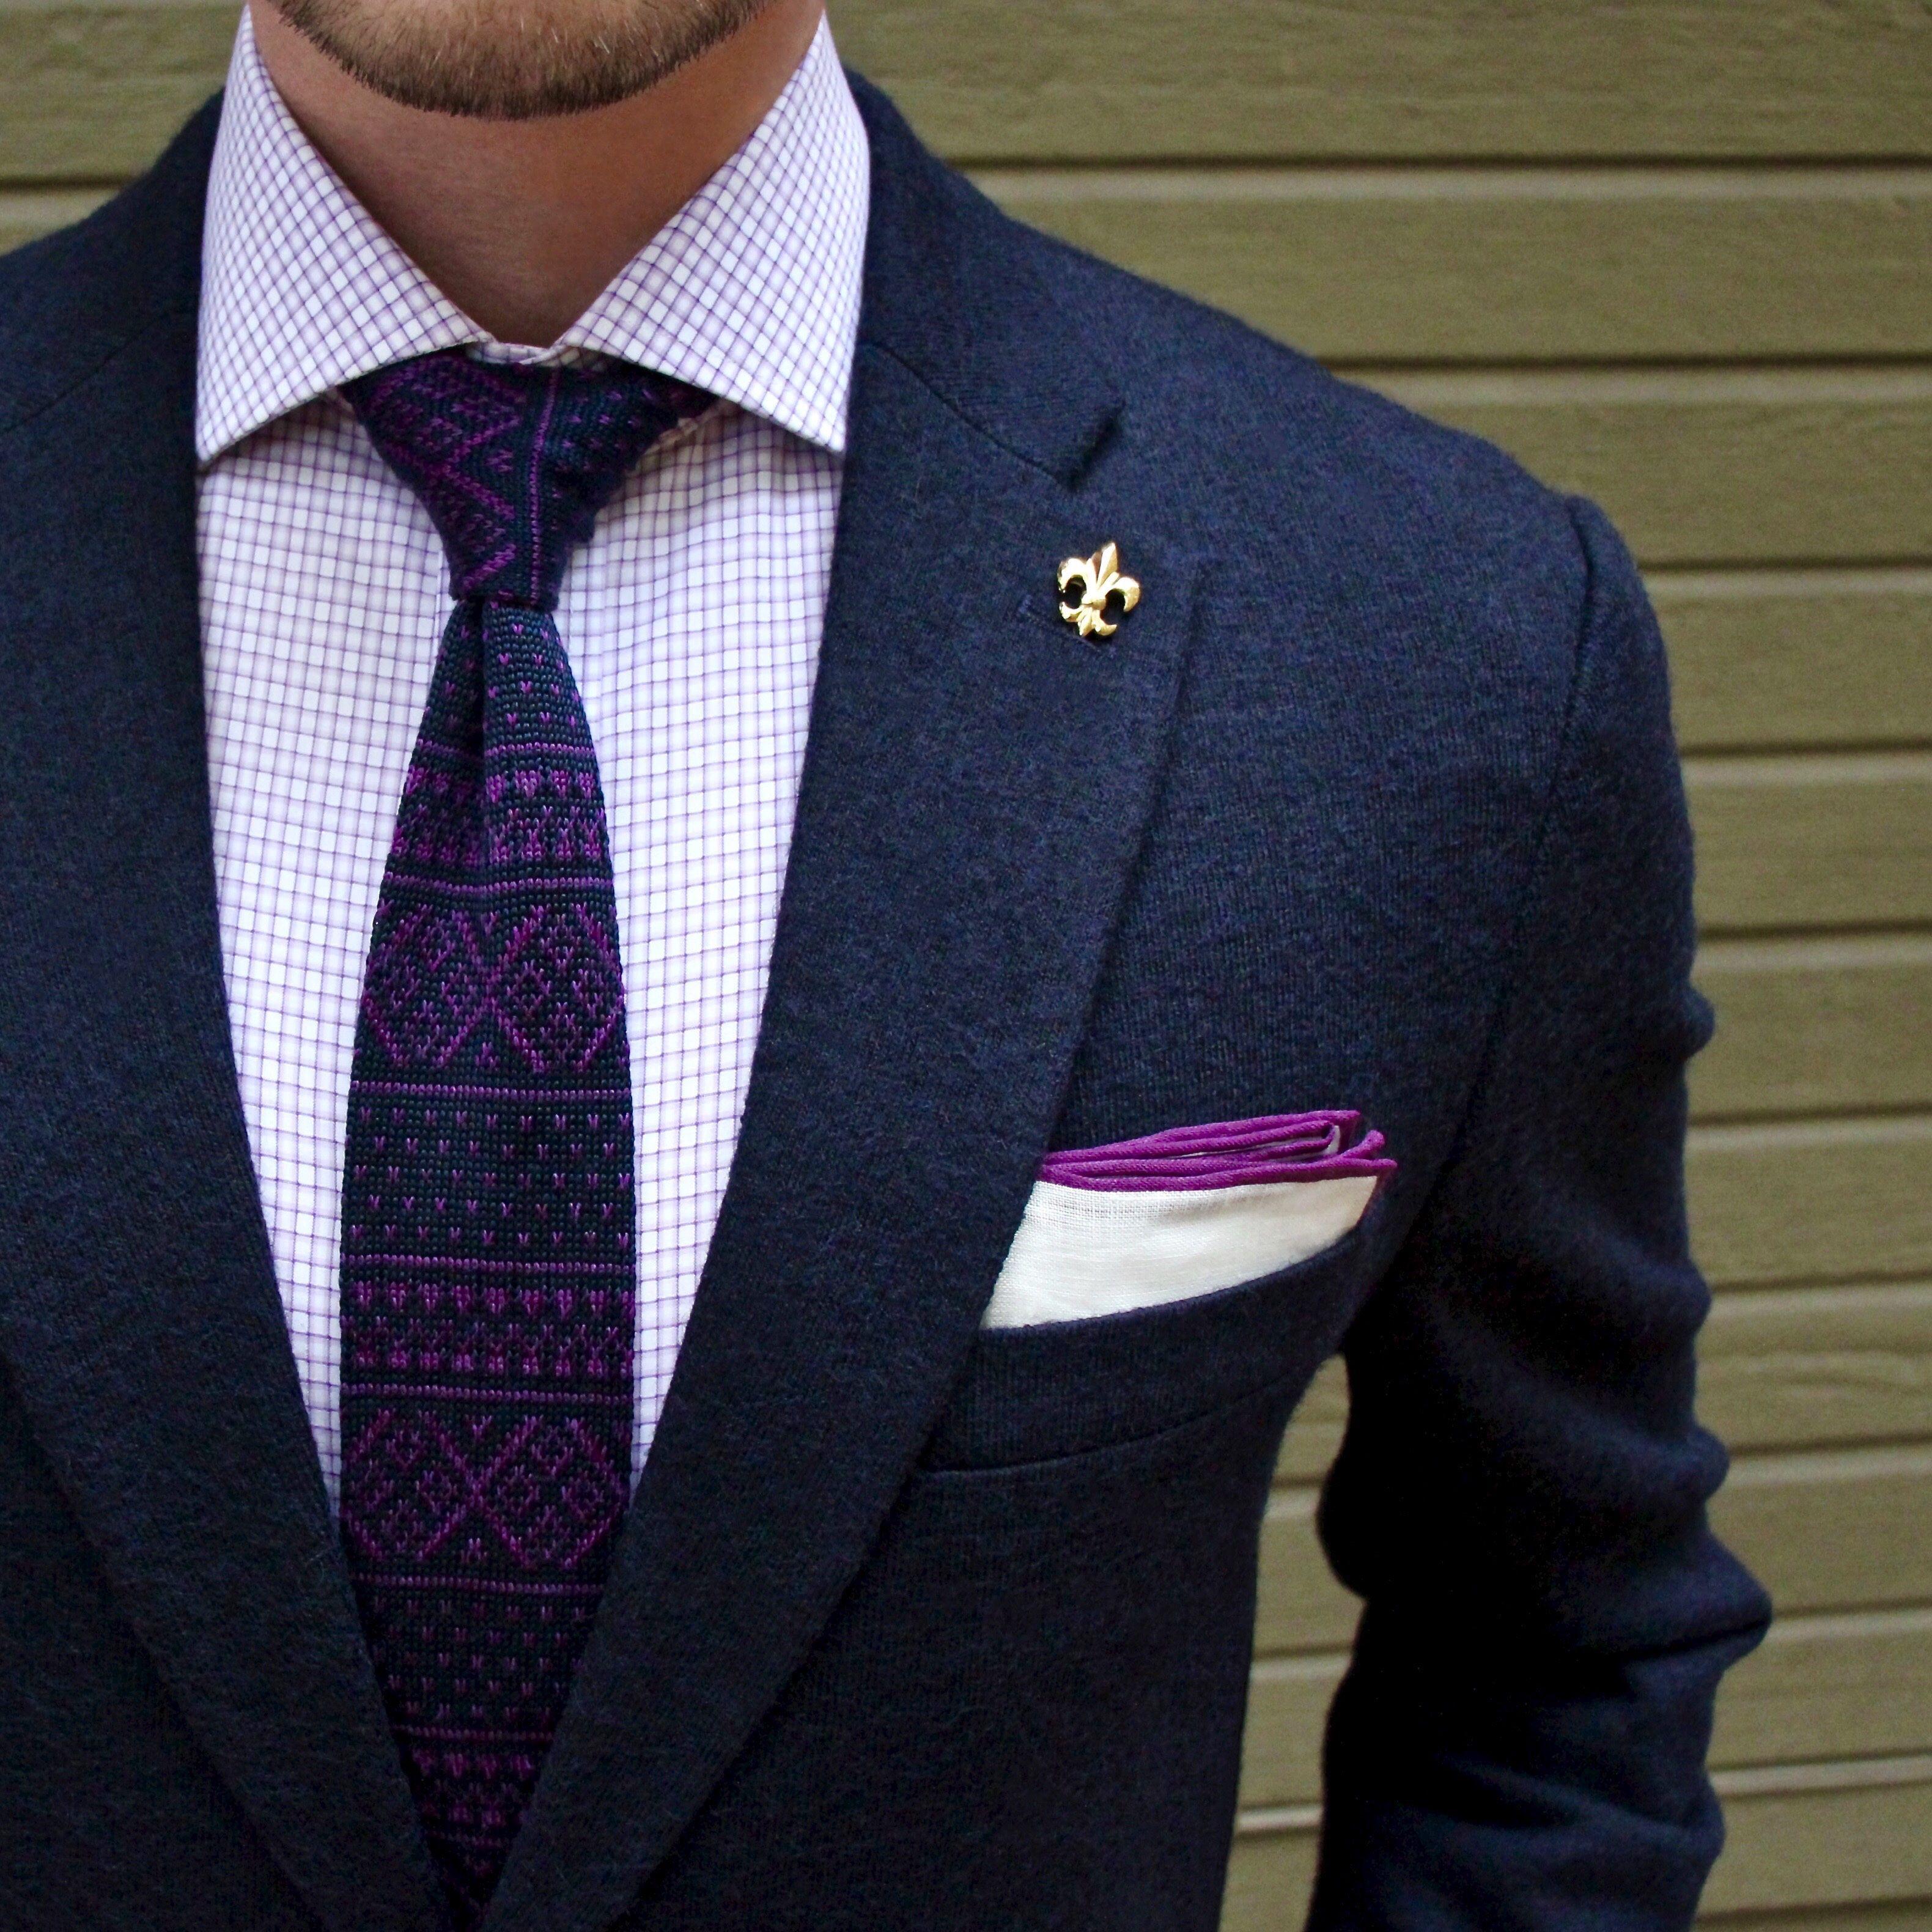 f07dad82 Fall dapper combo with purple fair isle knit tie purple striped shirt navy  blazer copper lapel pin purple lined white linen pocket square.